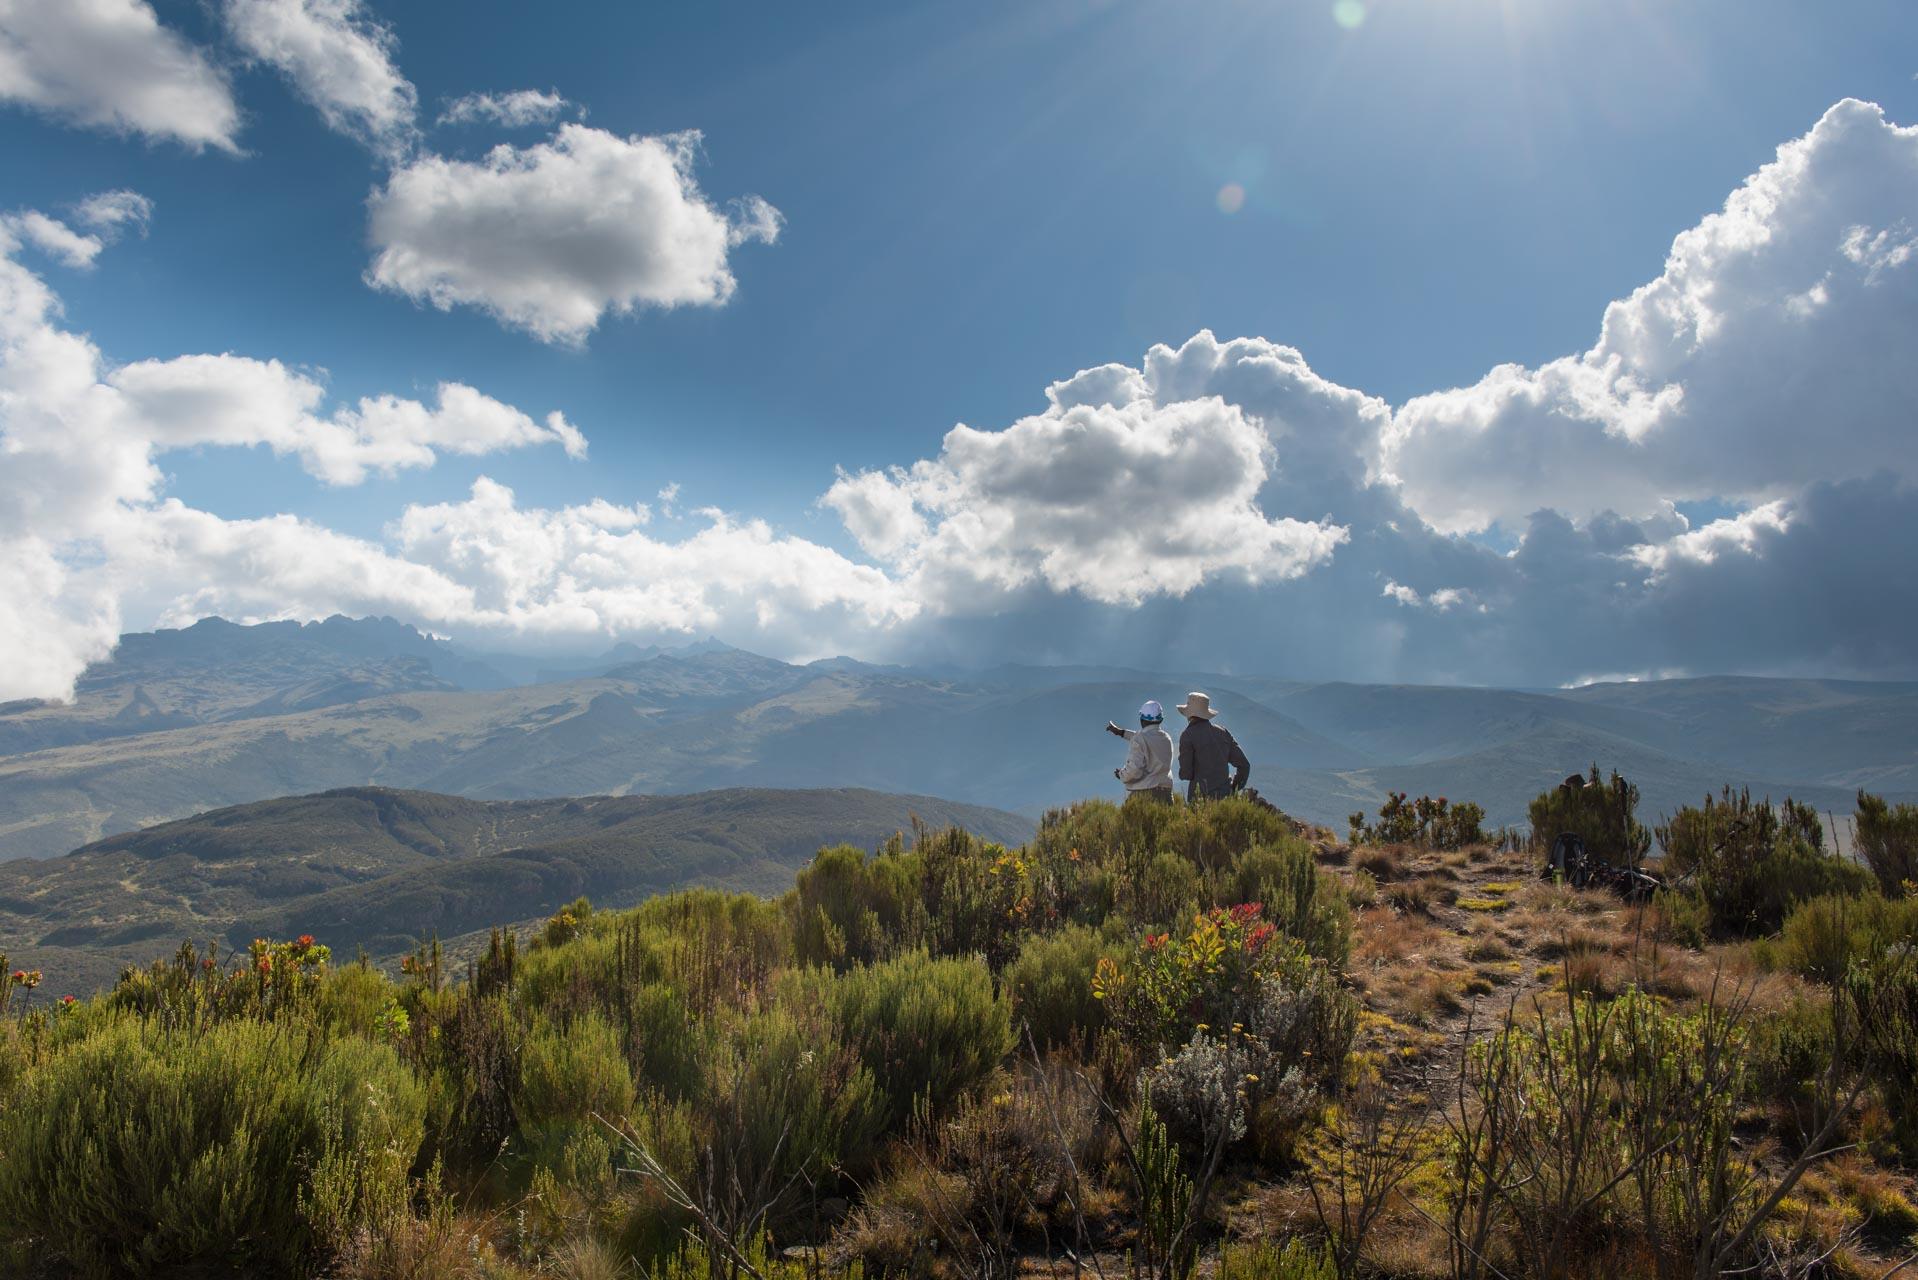 Mount Kenya in Kenia